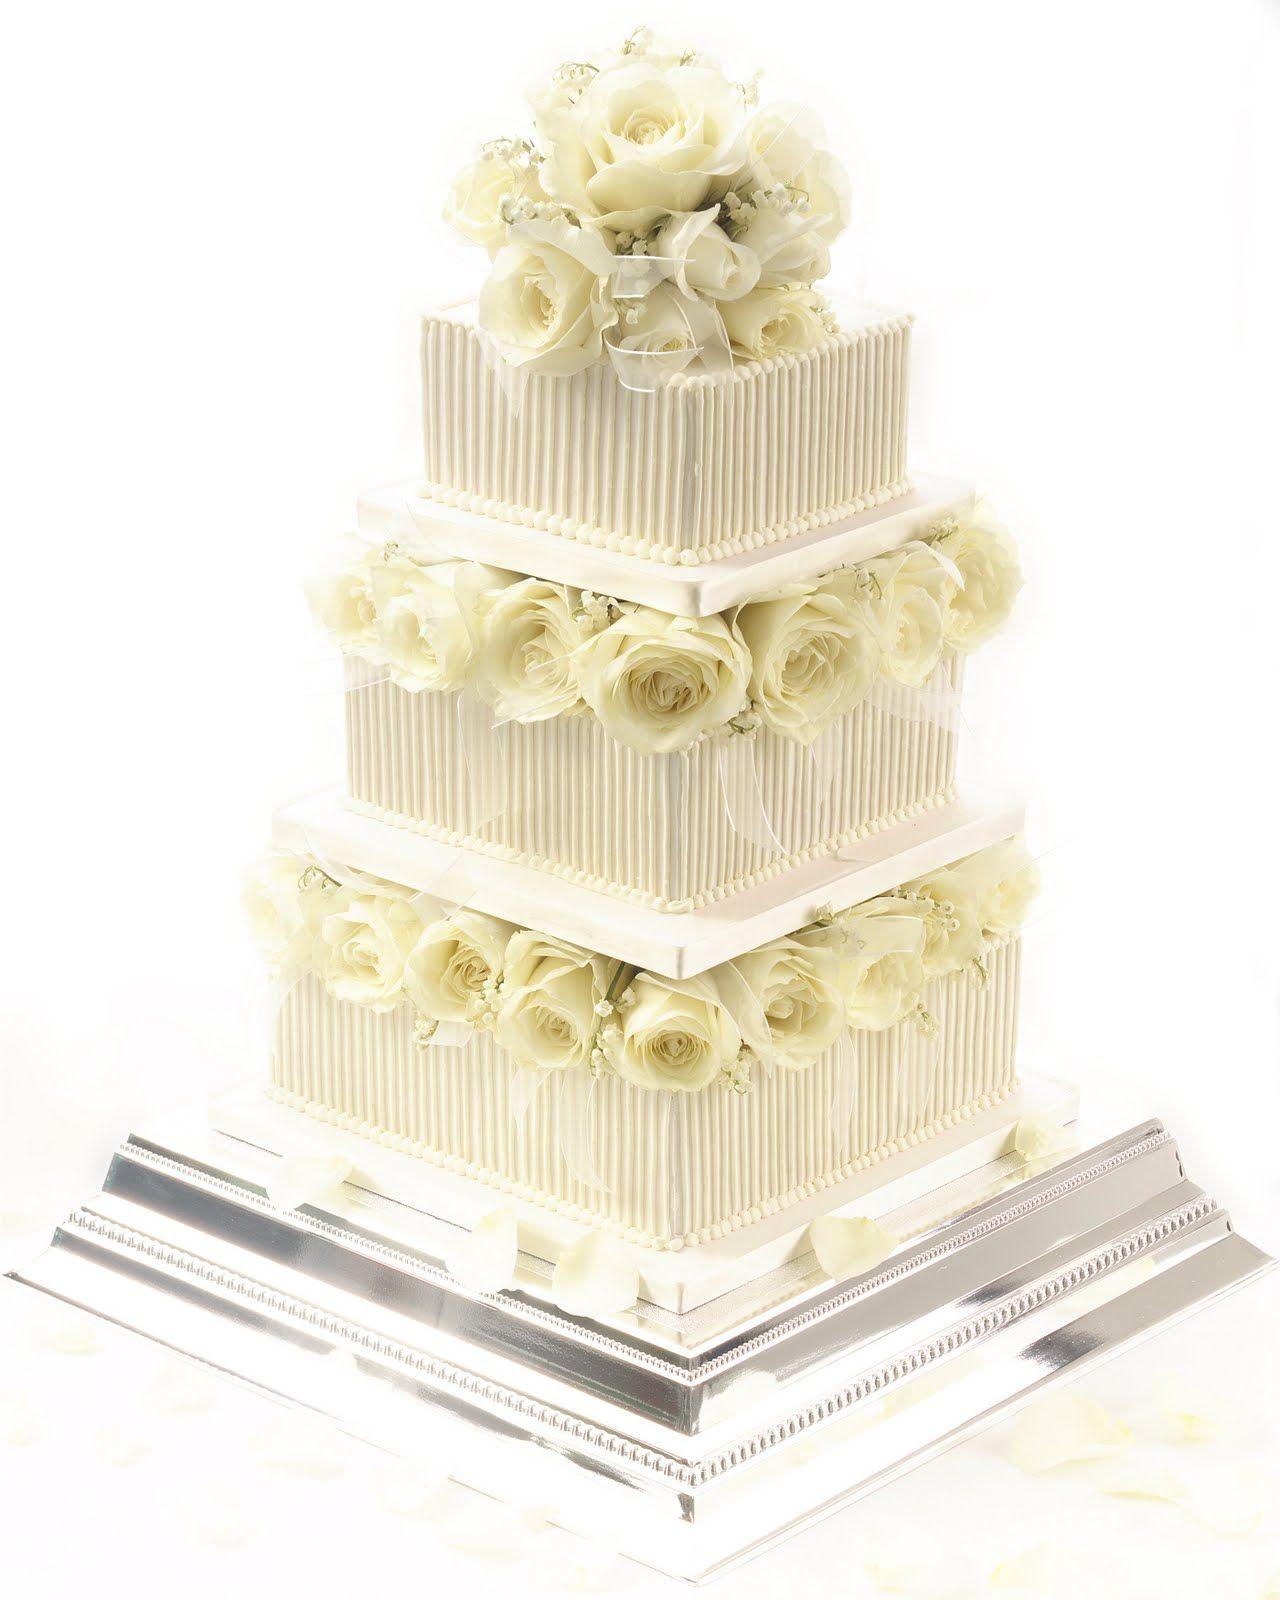 Pin by Ben D. Avidan on Chocolate cakes | Pinterest | Cake ...